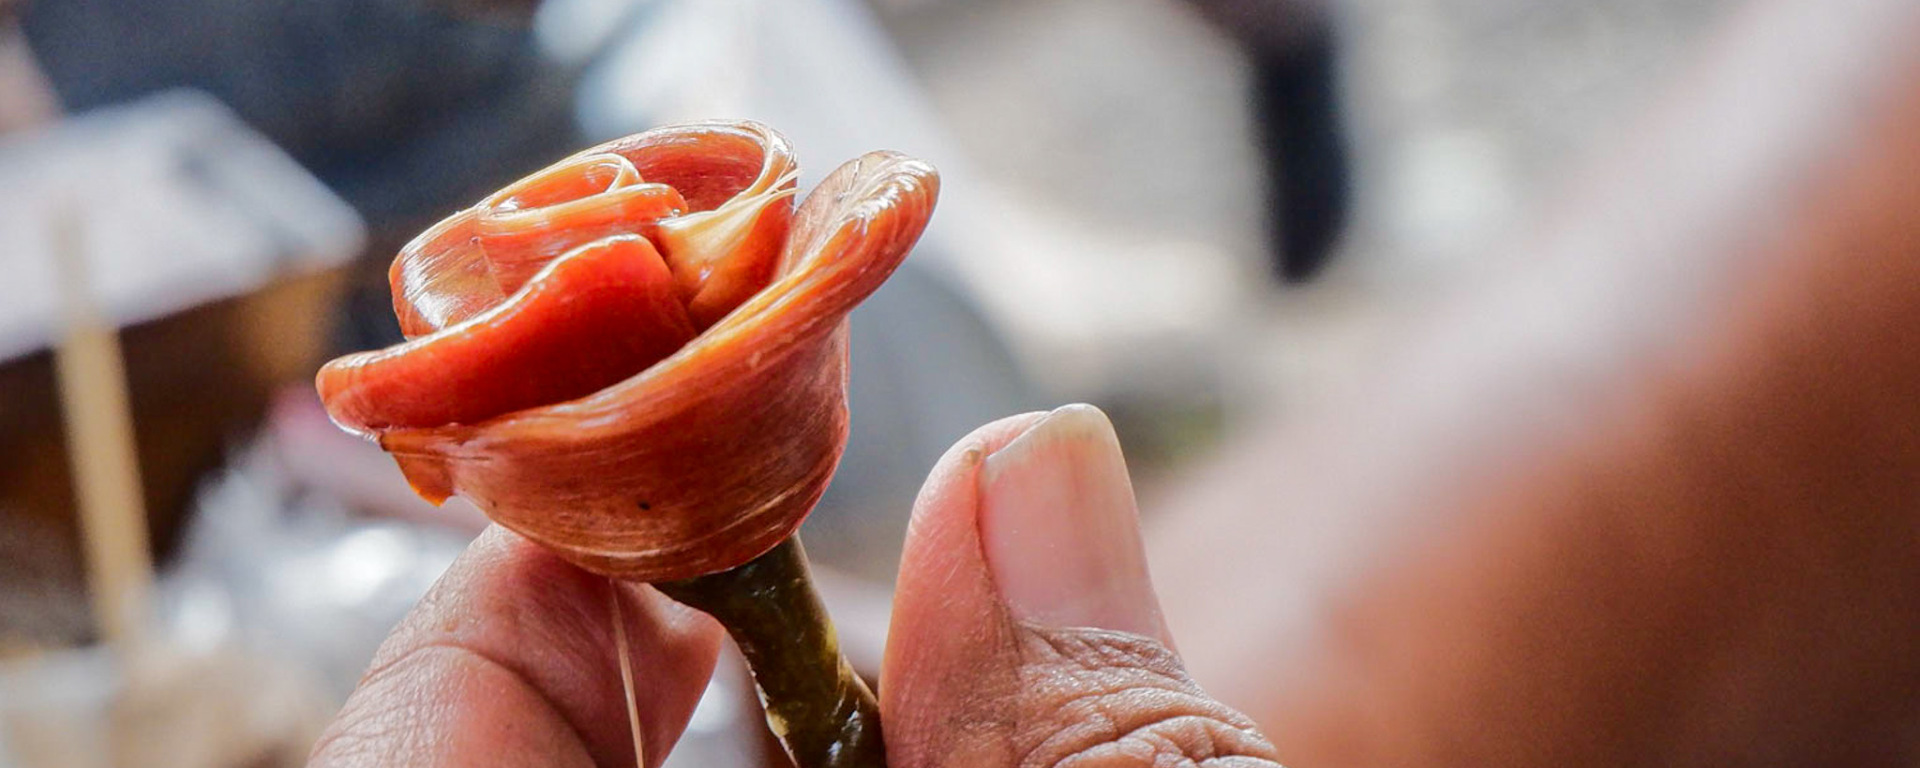 Cara Membuat Gulali Gula Merah